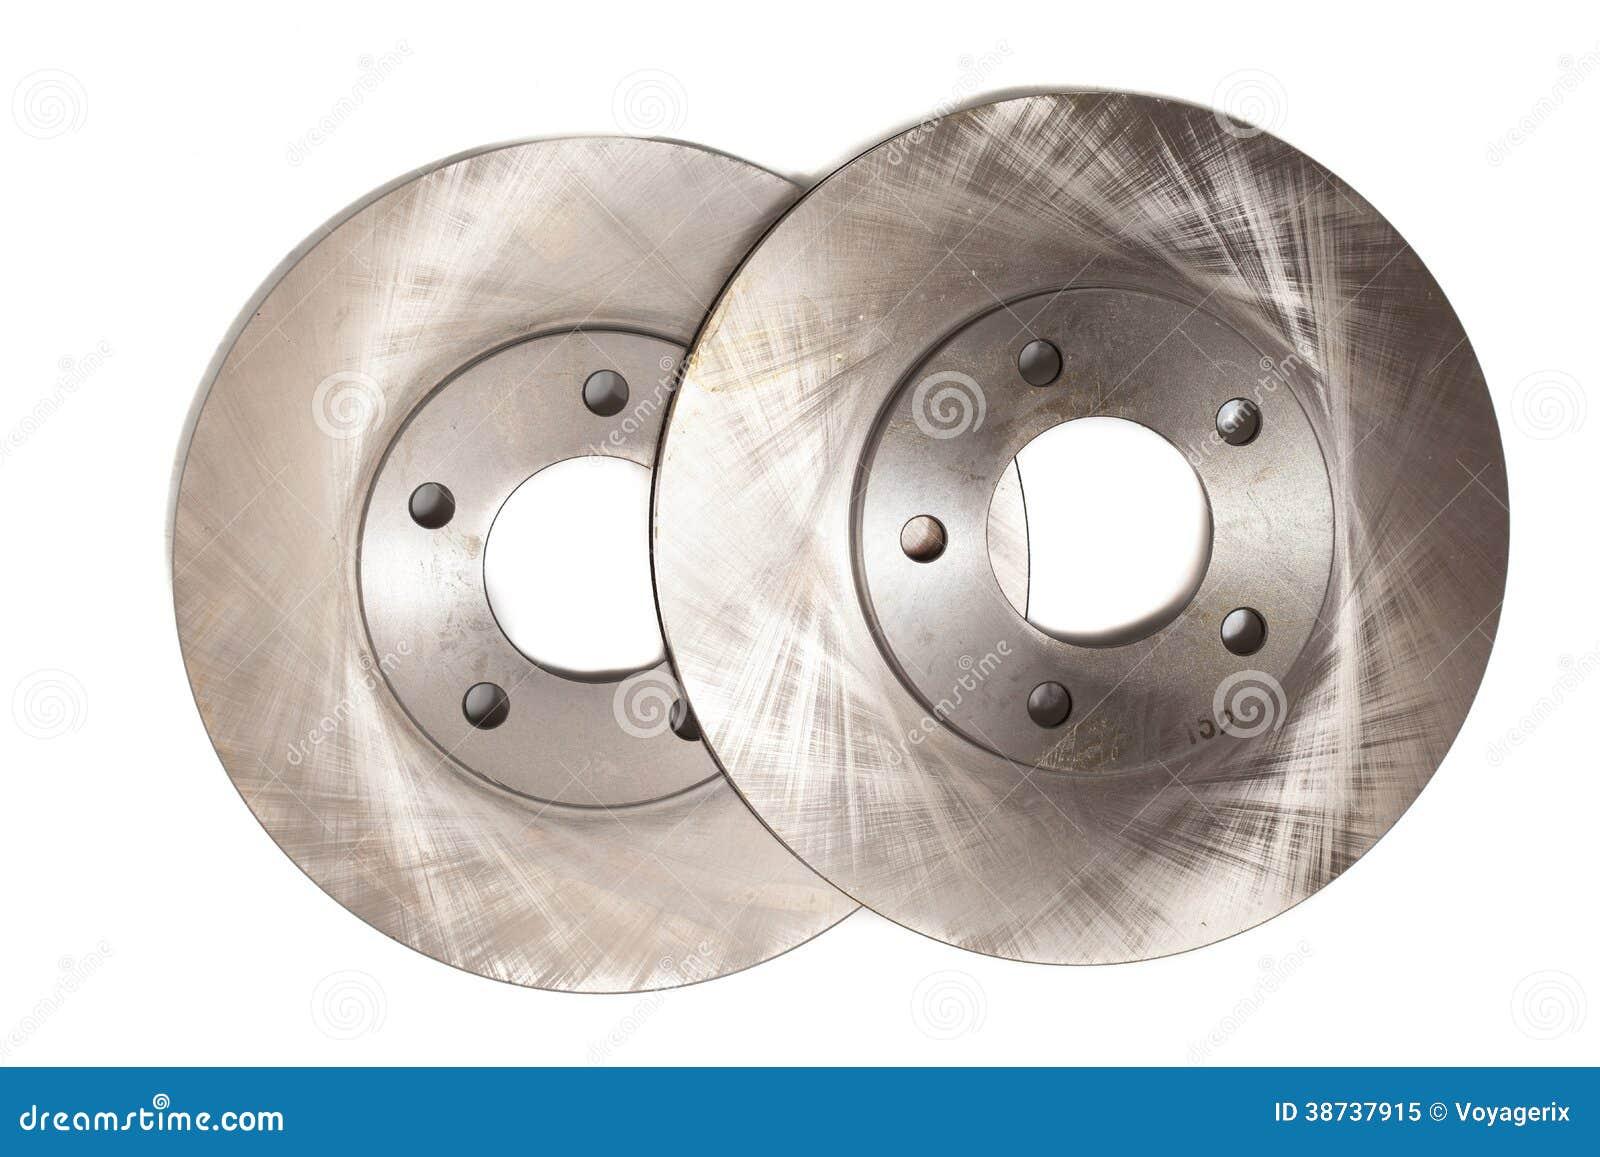 Замена задних тормозных дисков на Skoda Yeti